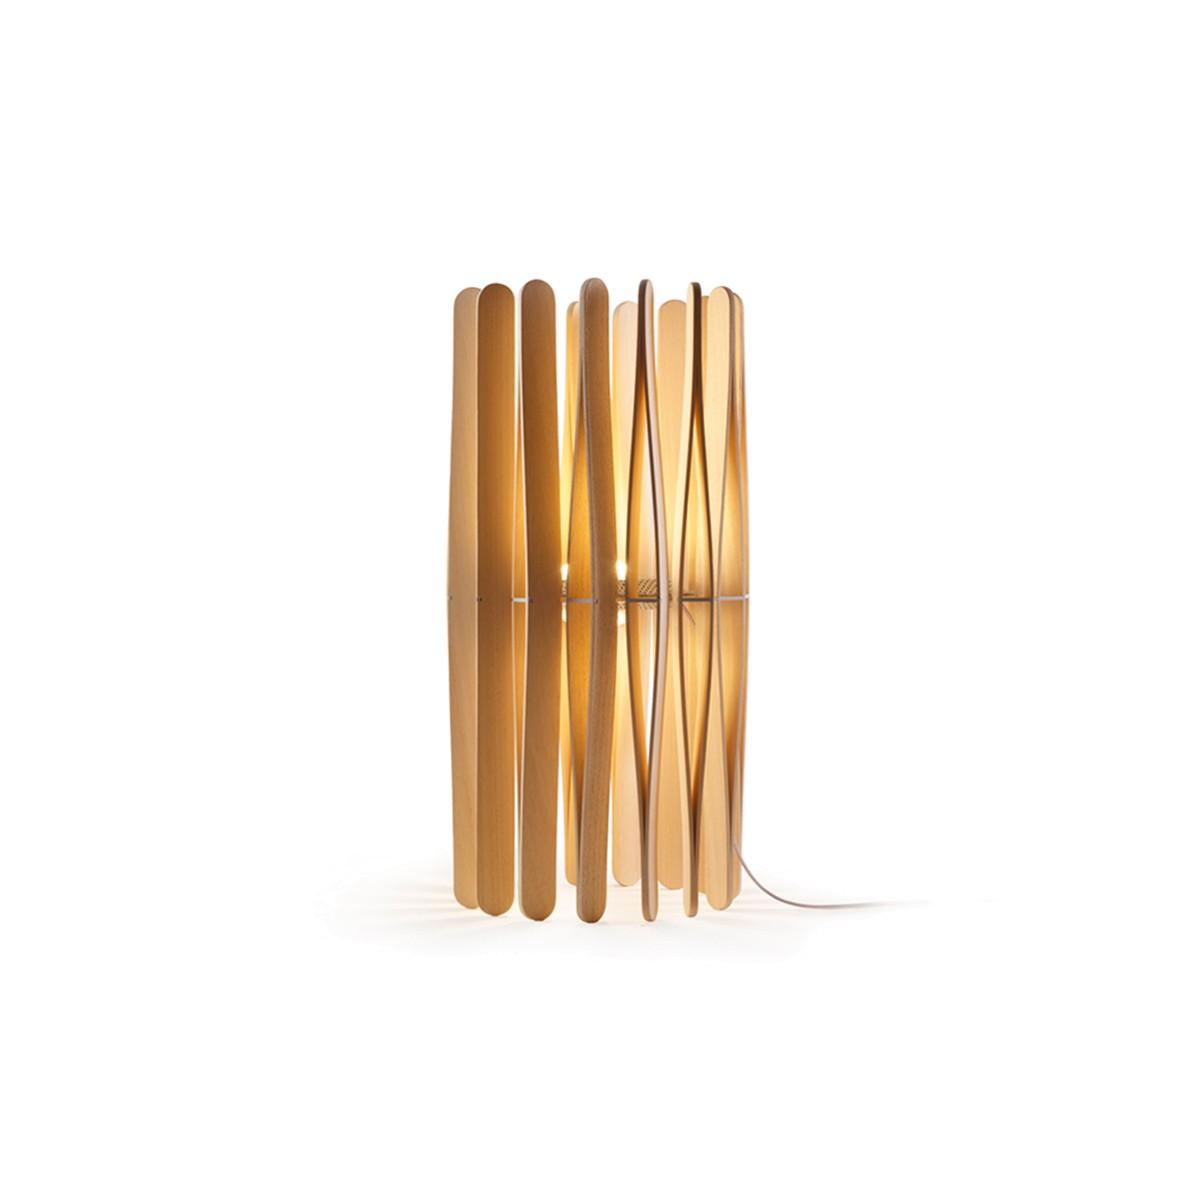 Fabbian Stick Tischleuchte LED (Platine), Holz